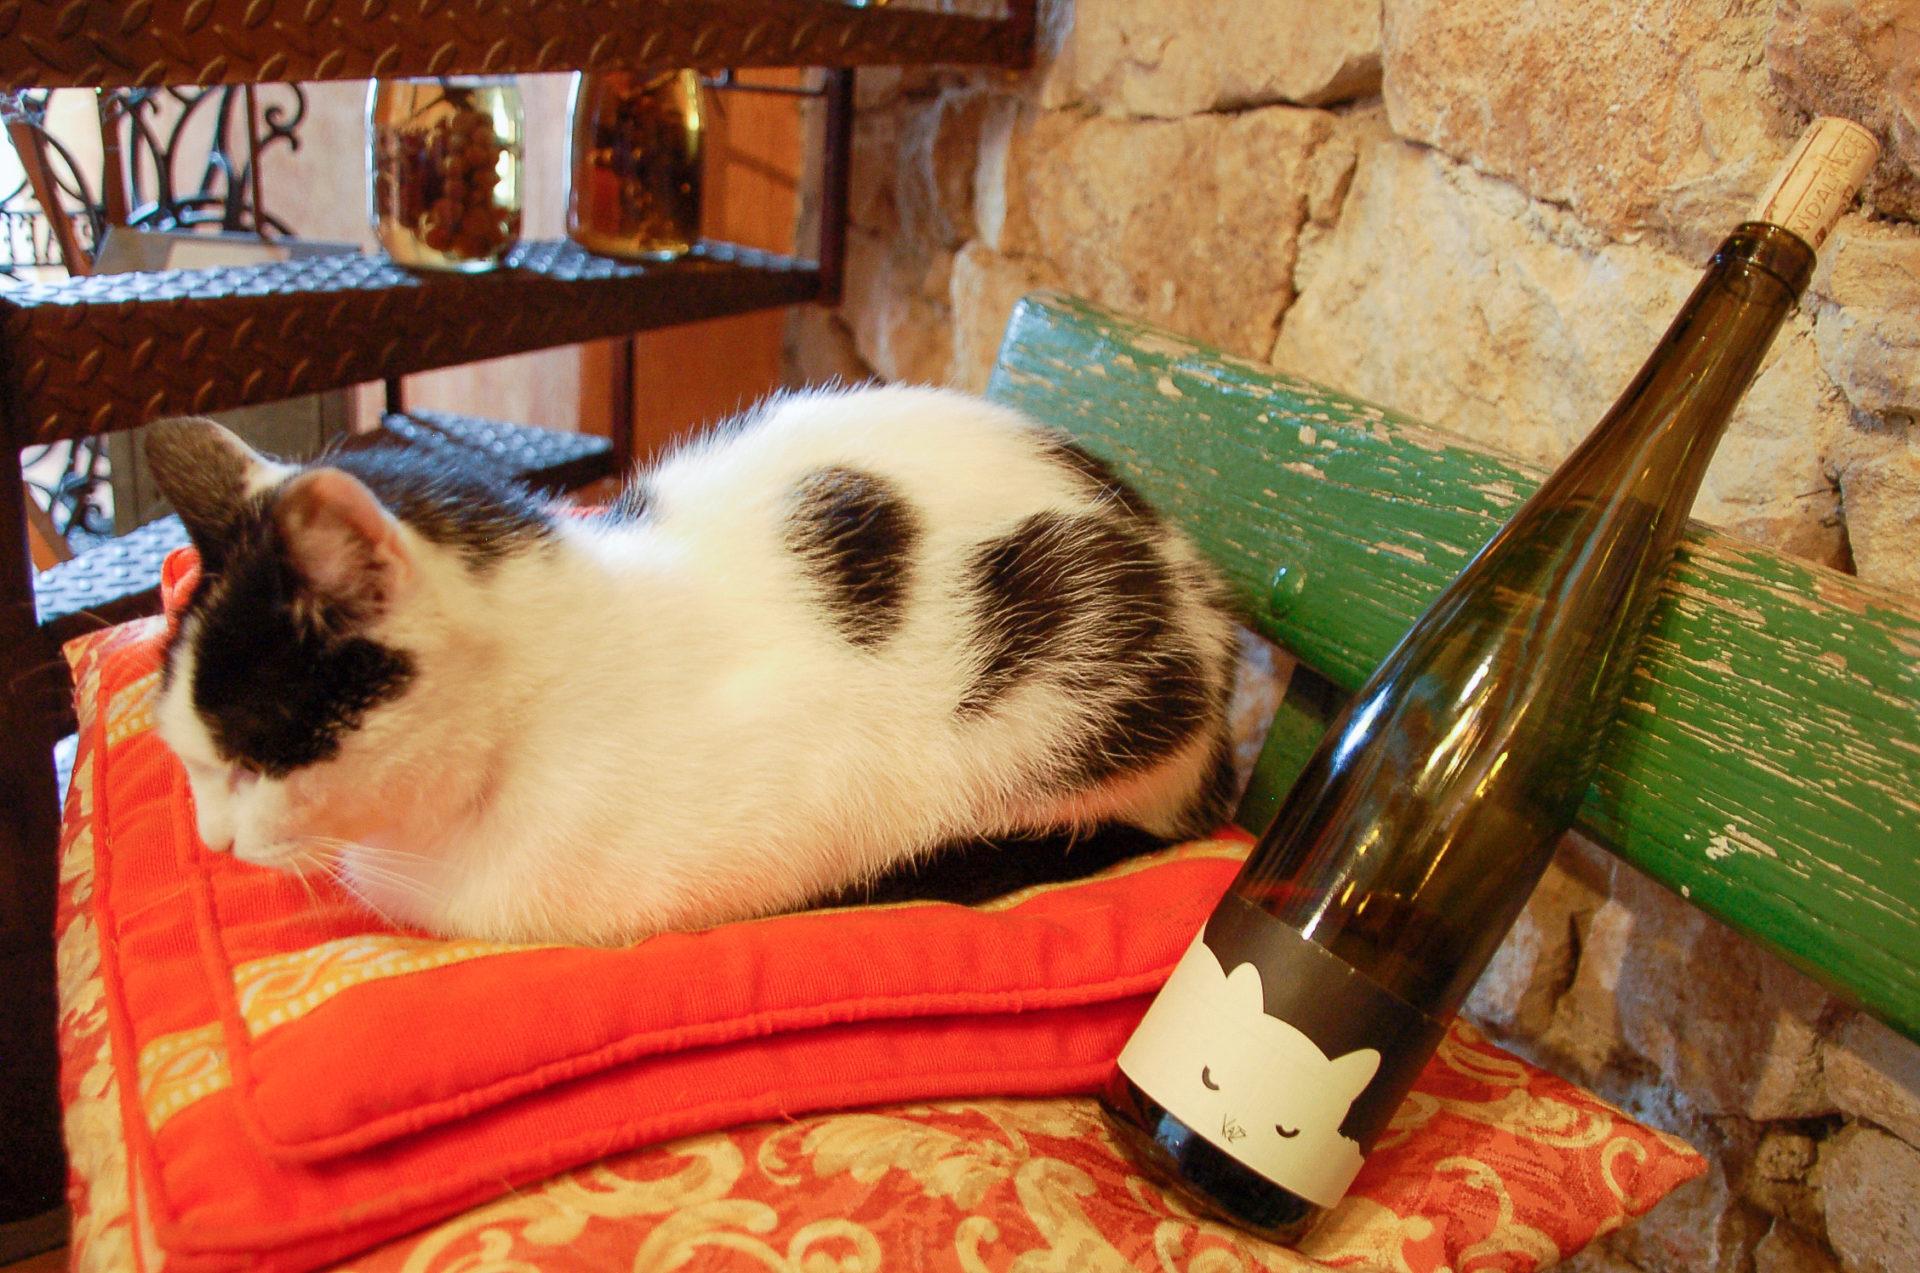 Katze mit Katzenwein in Katzenthal im Elsass